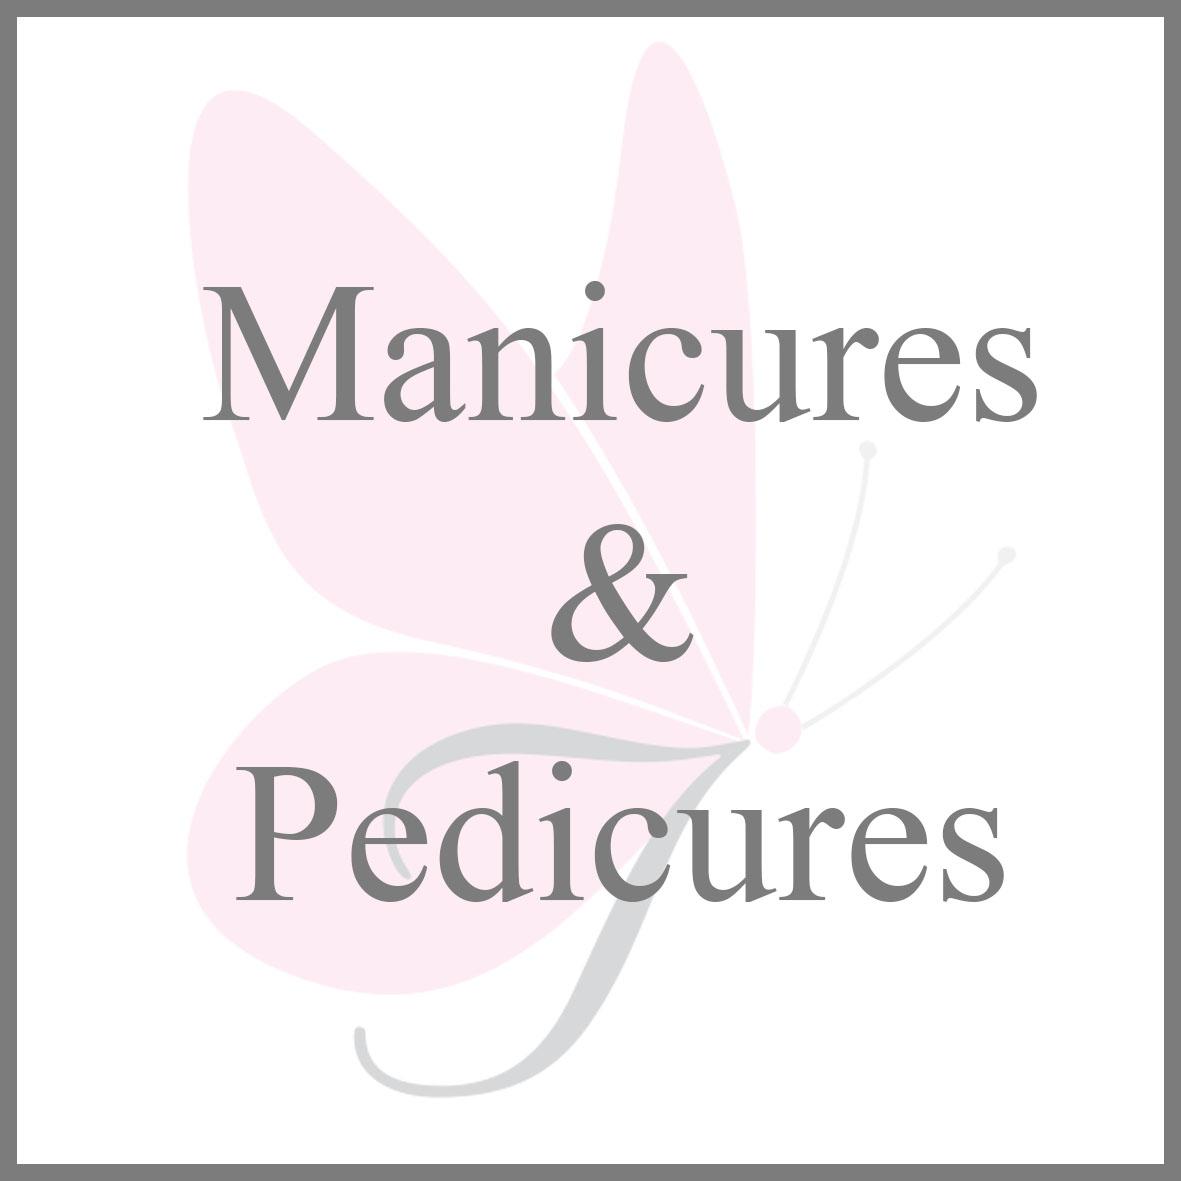 Manicures&Pedicures.jpg